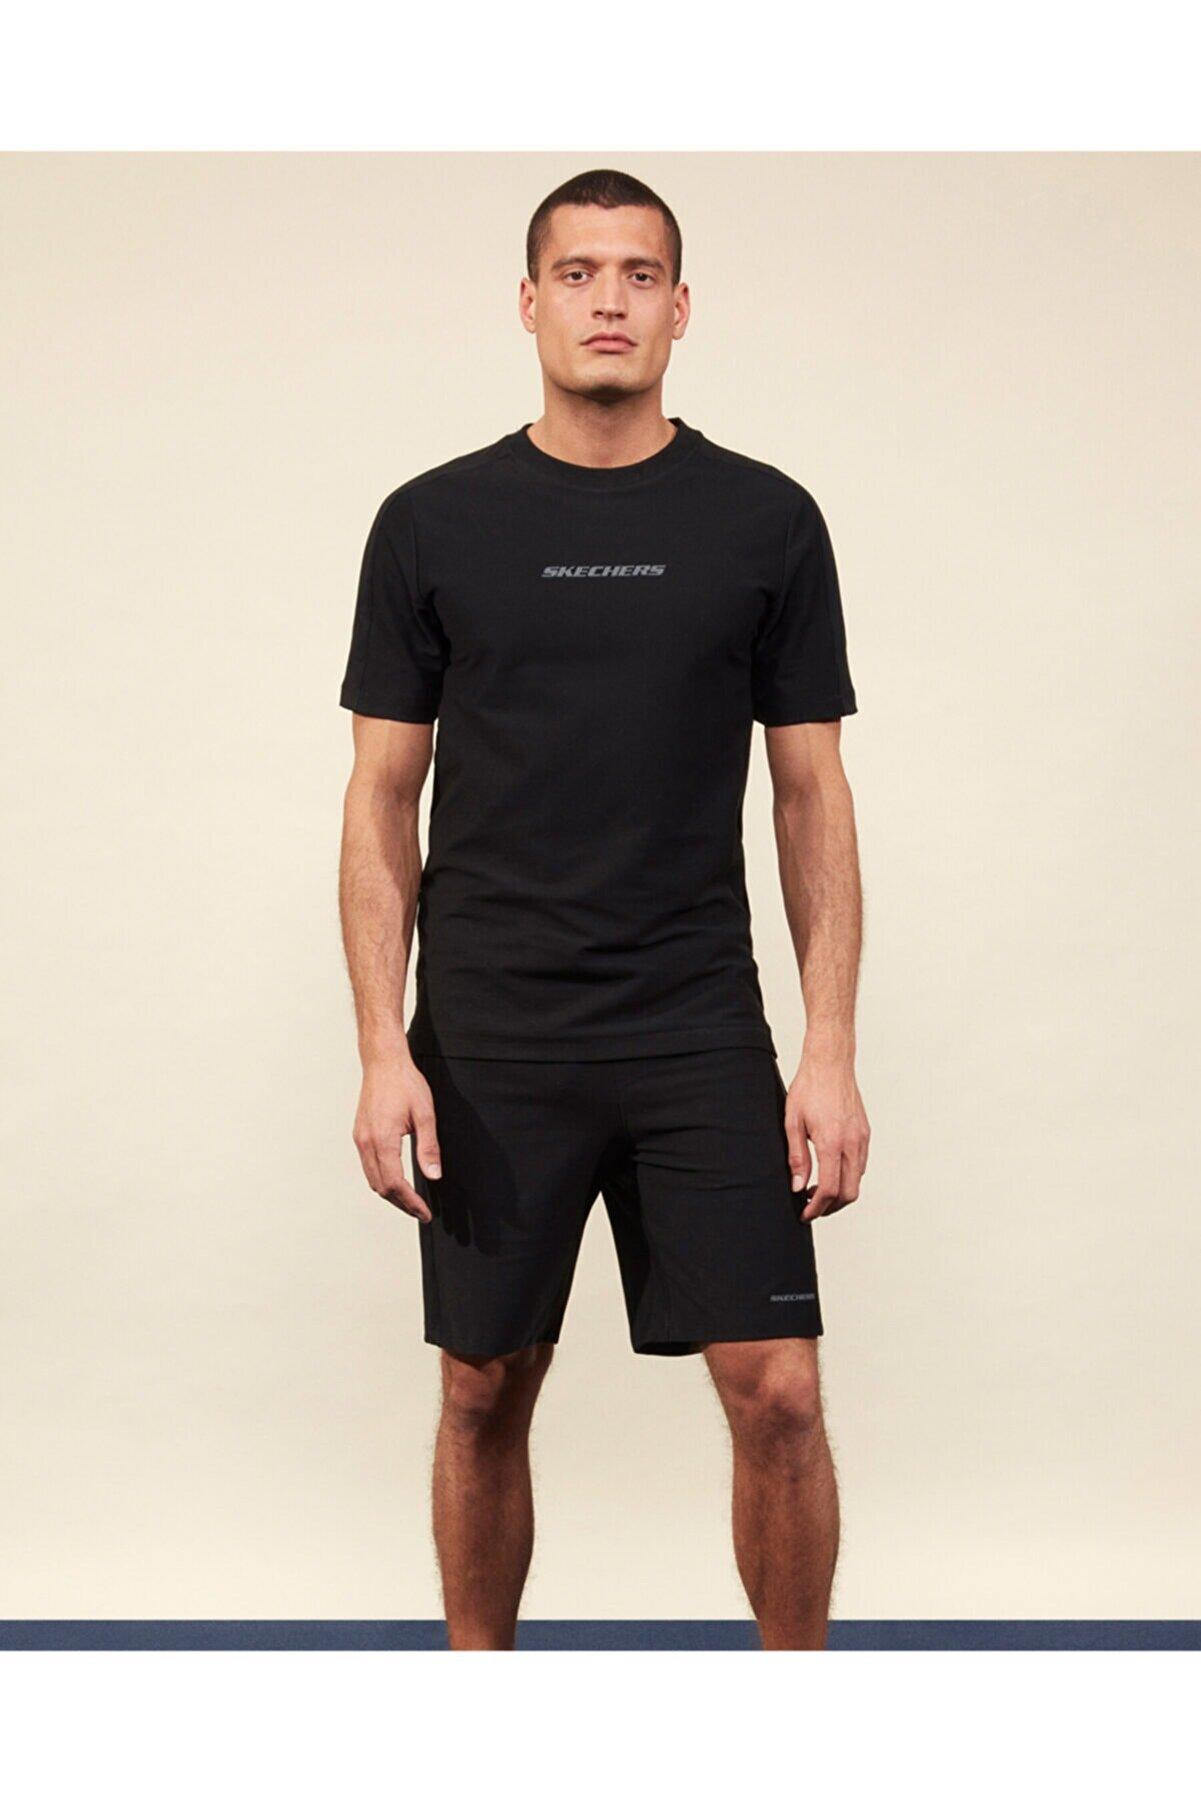 Skechers Erkek Siyah Spor Şort